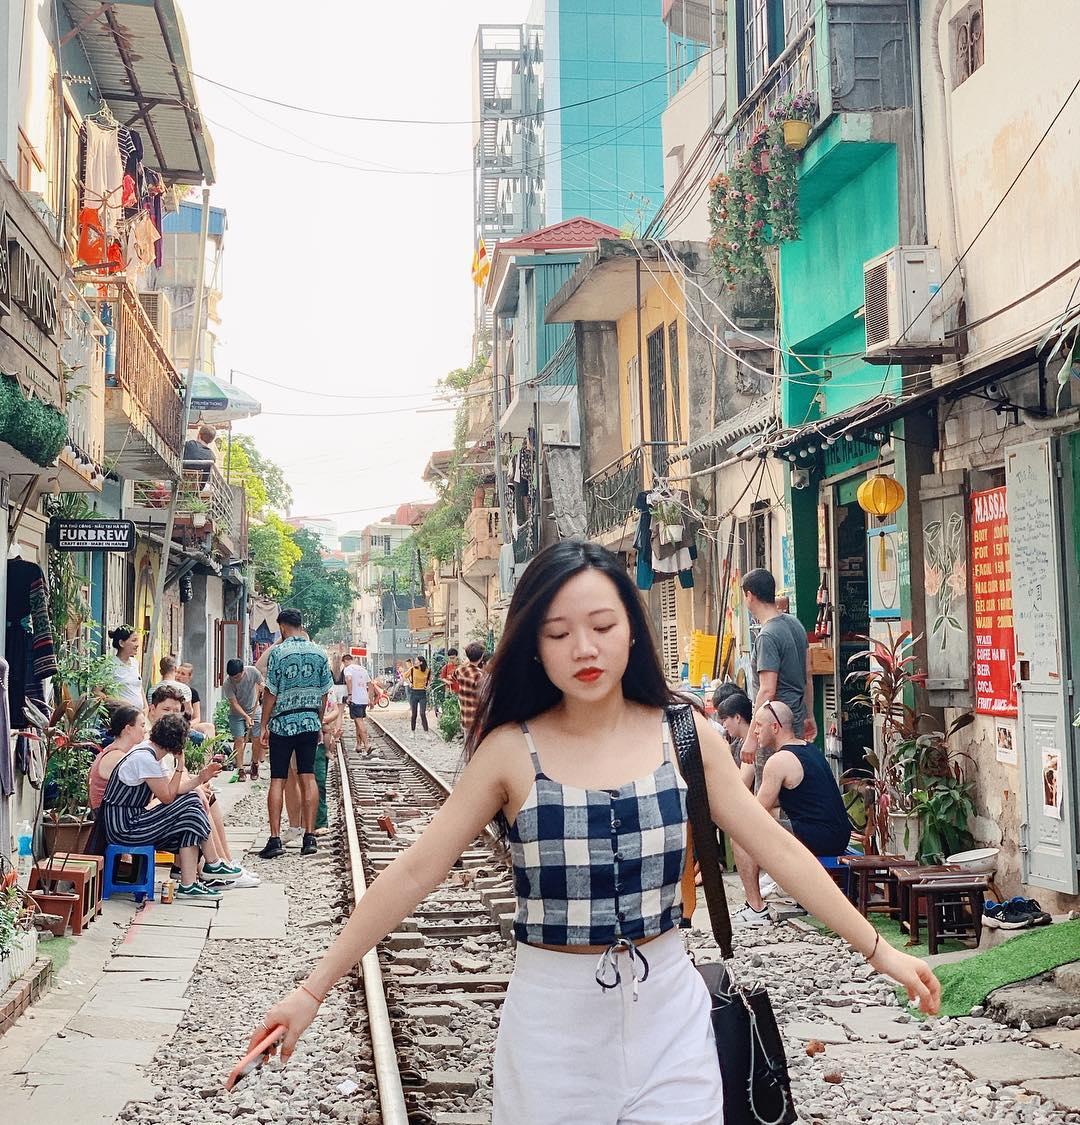 hanoi_xom-cafe-duong-tau-ha-noi-1